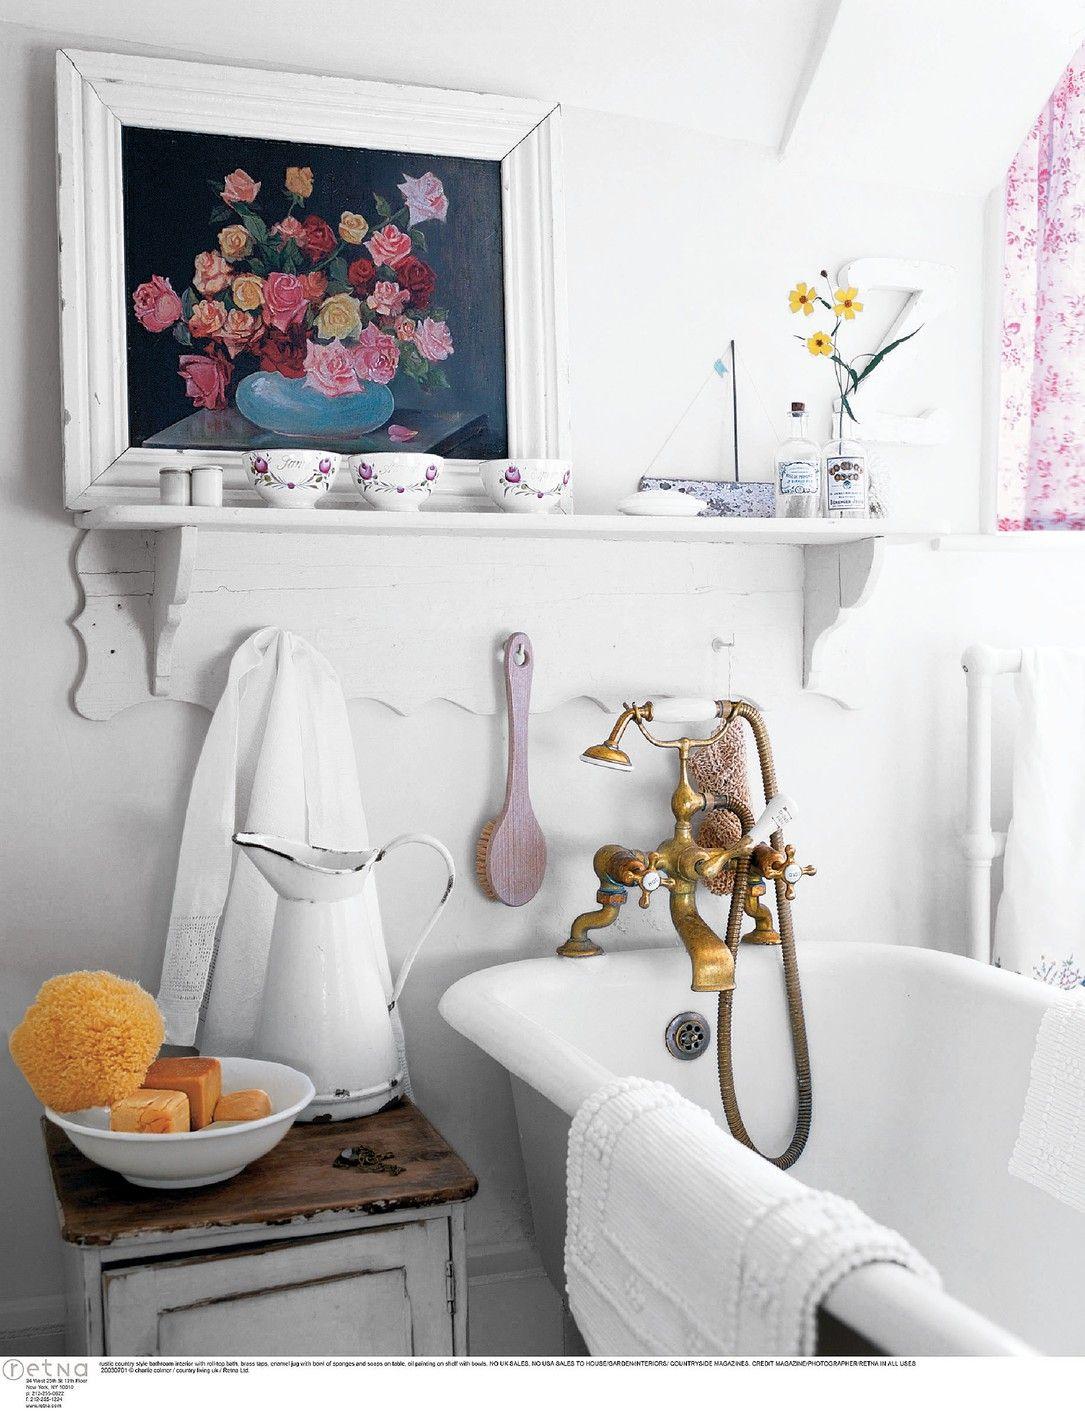 Tremendous 47 Rustic Bathroom Decor Ideas Rustic Modern Bathroom Designs Home Interior And Landscaping Ologienasavecom